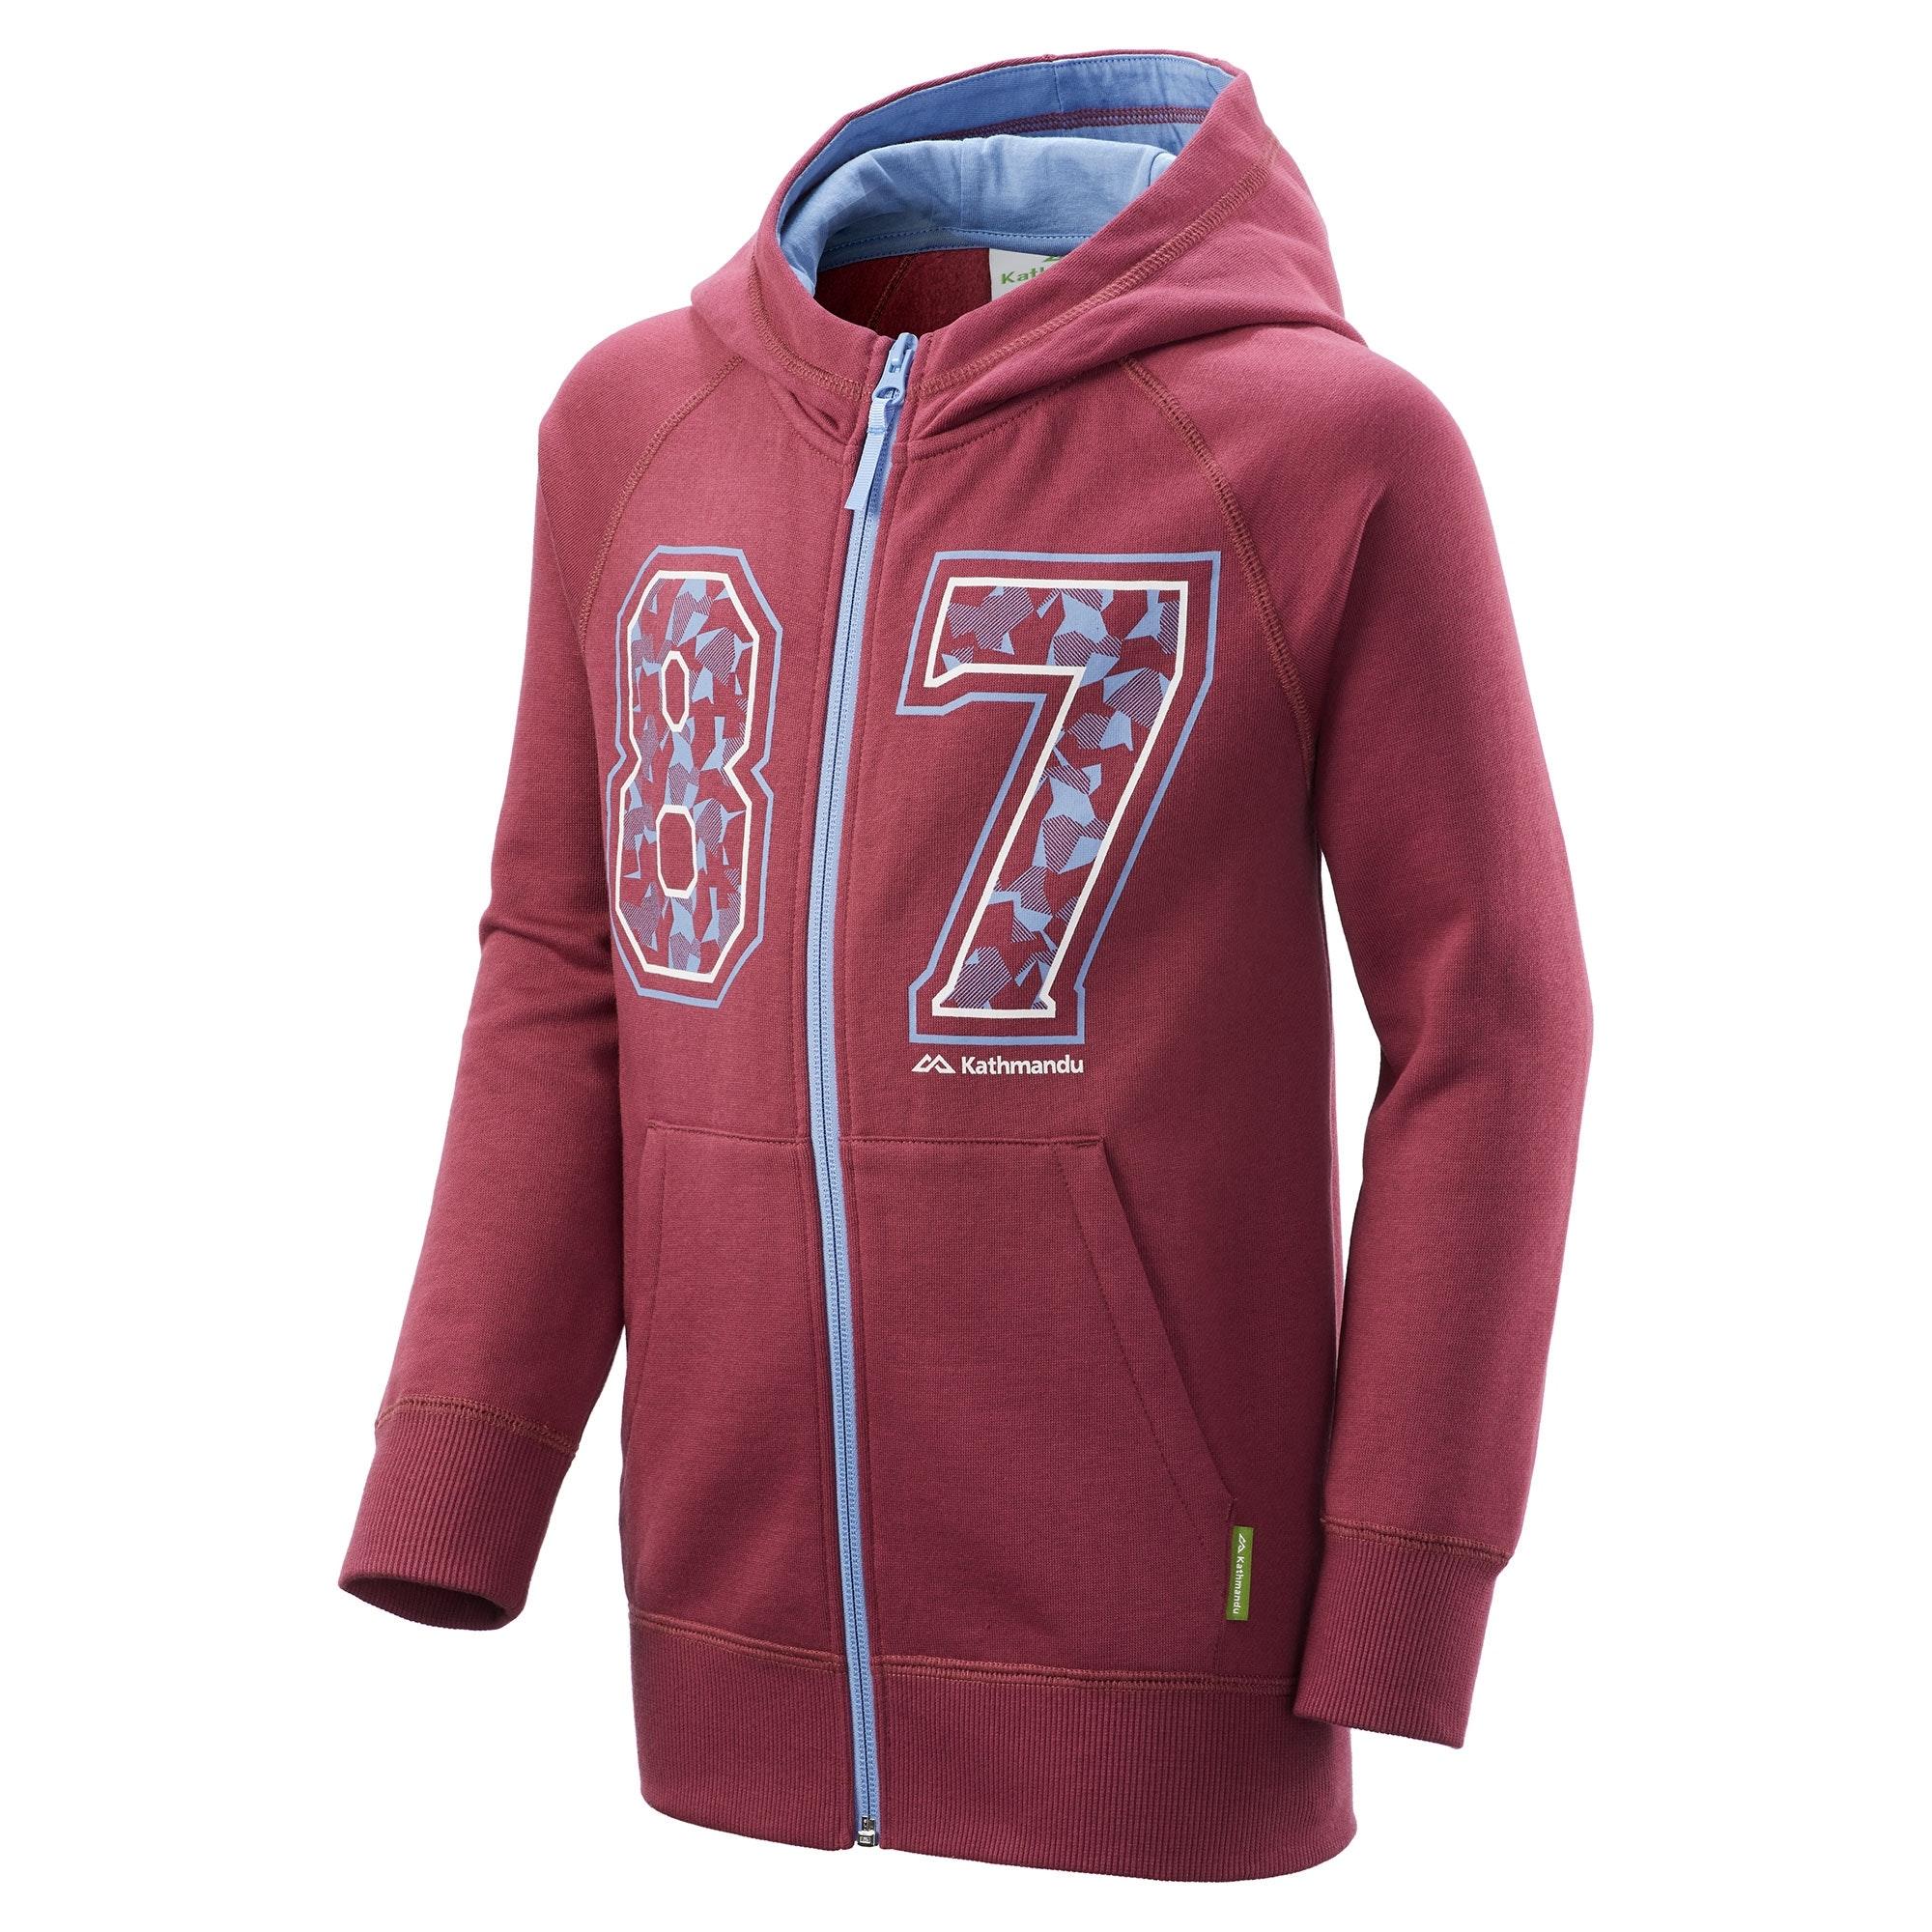 NEW-Kathmandu-Youth-Boy-039-s-Girl-039-s-Full-Zip-Hooded-Winter-Warm-Fleece-Jacket thumbnail 24